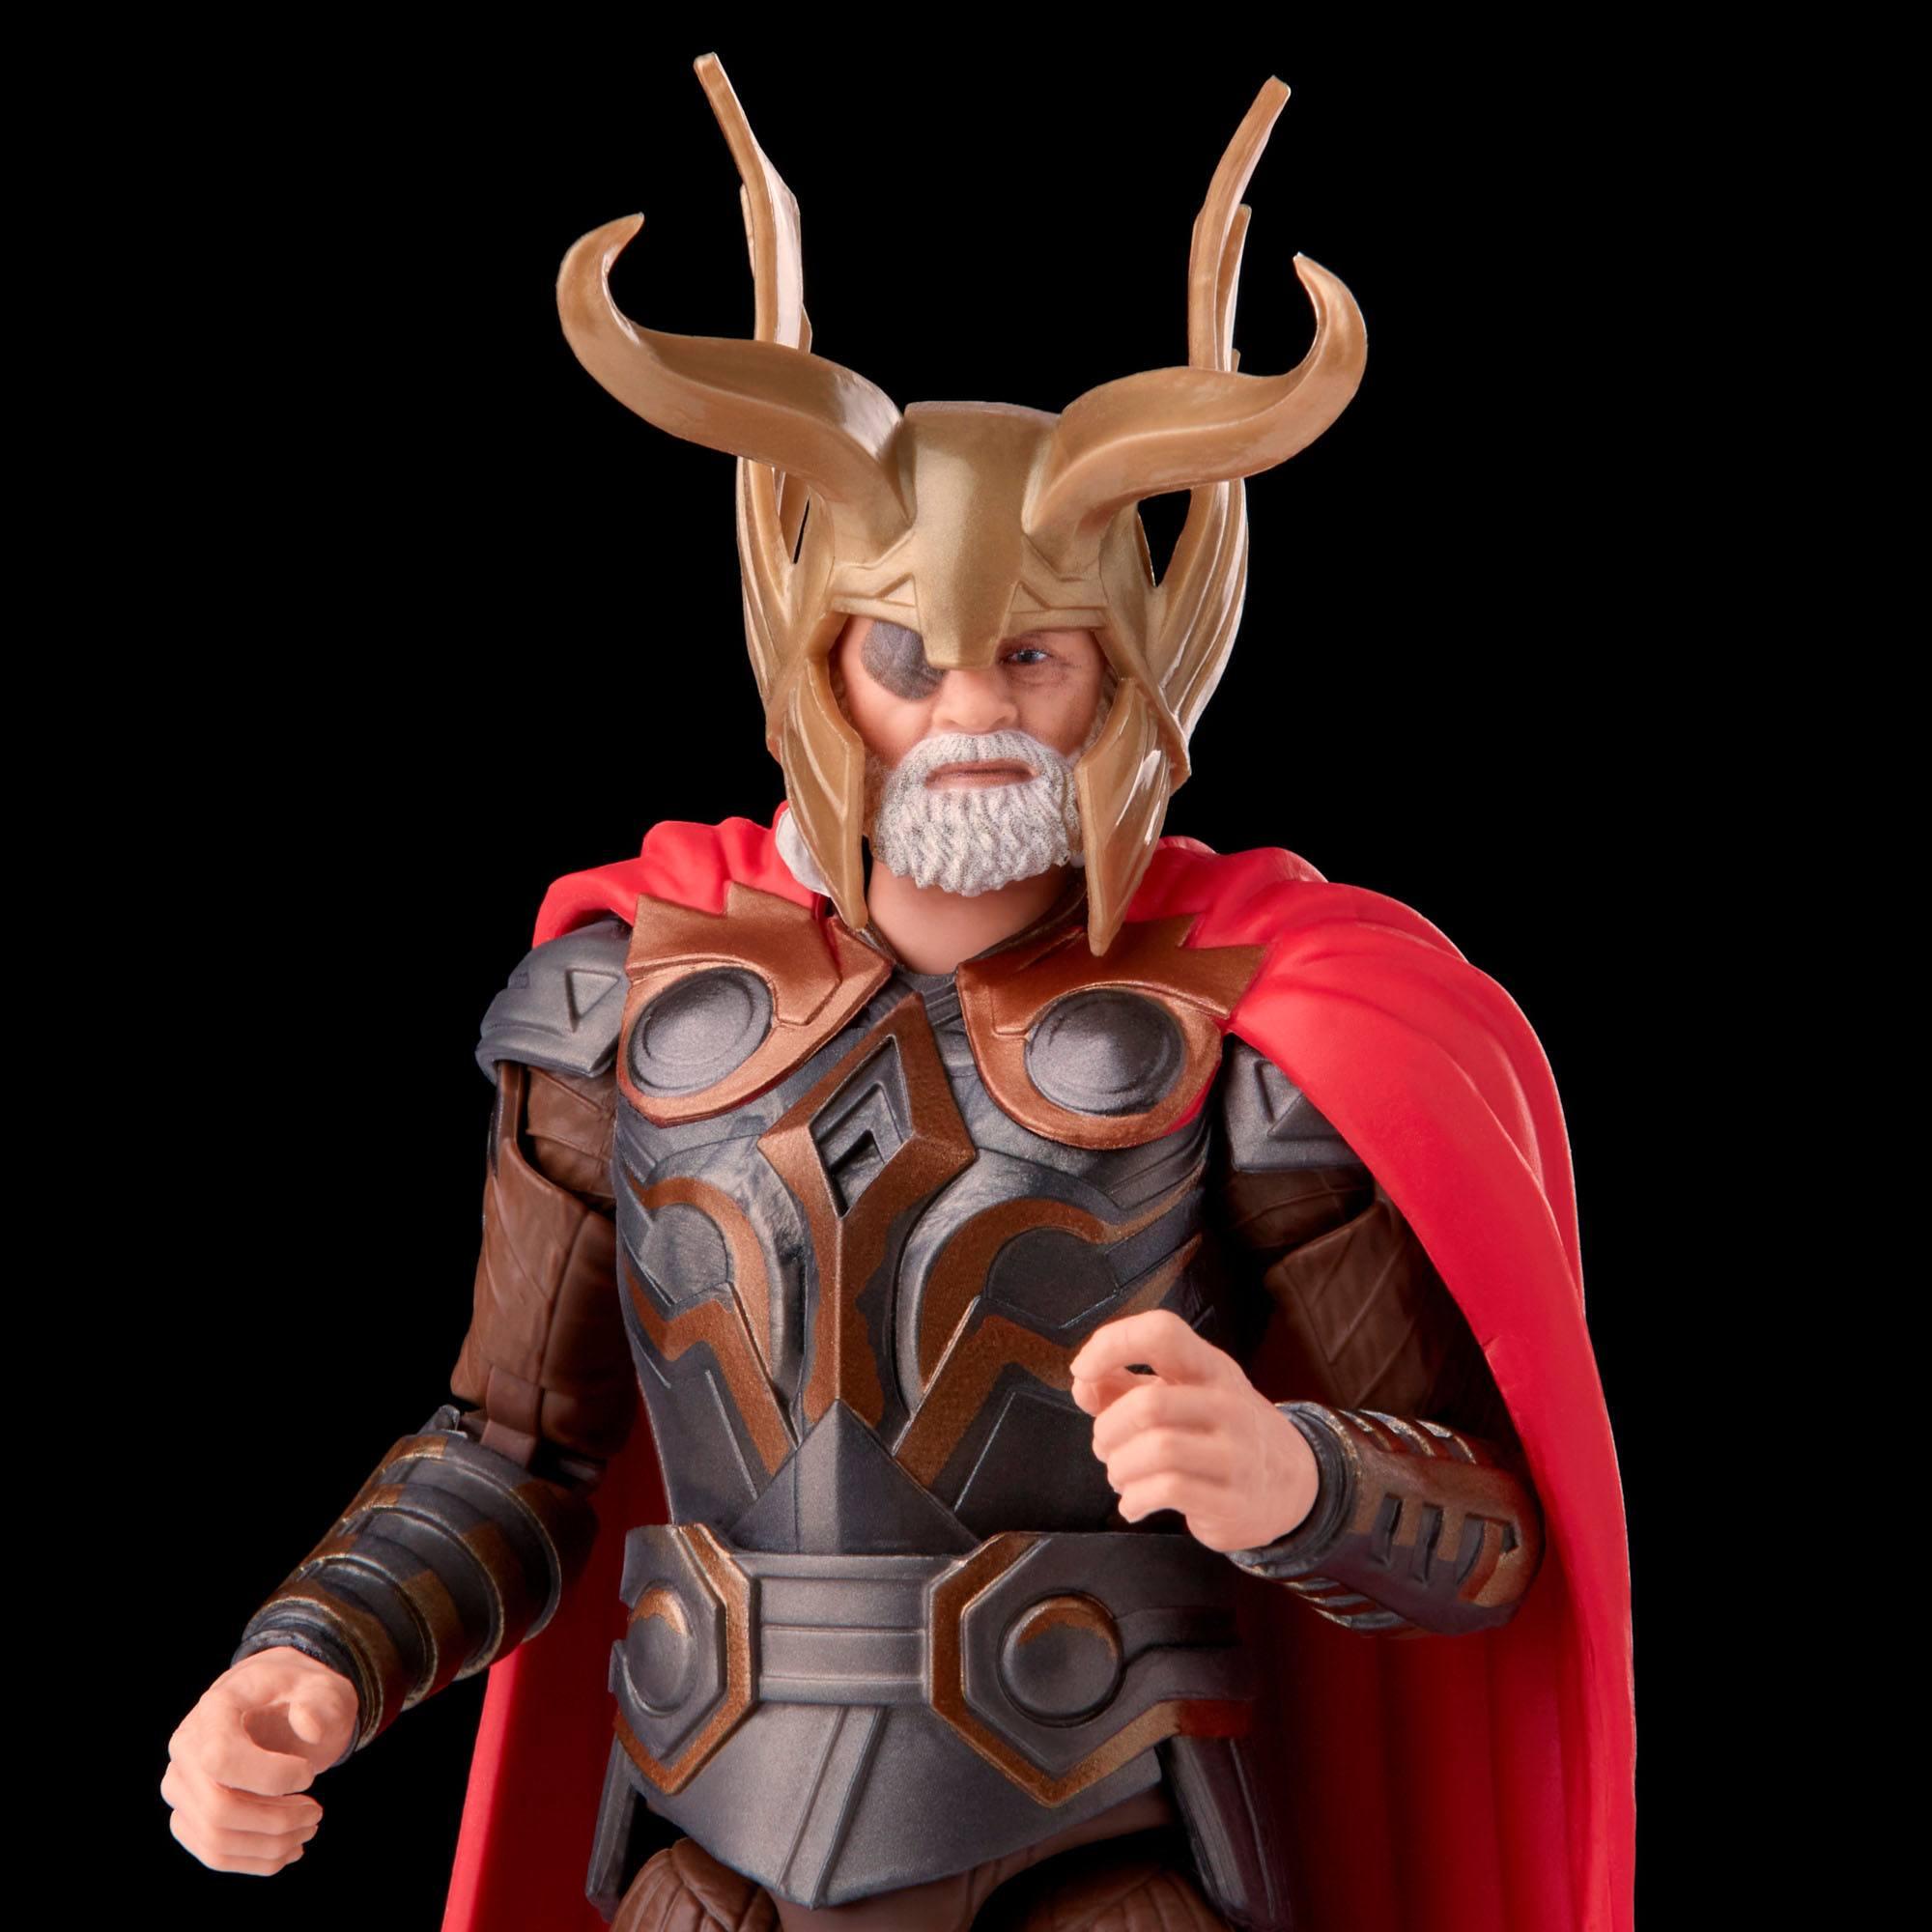 The Infinity Saga Marvel Legends Series Actionfigur 2021 Odin (Thor) 15 cm F01875L0 5010993839384